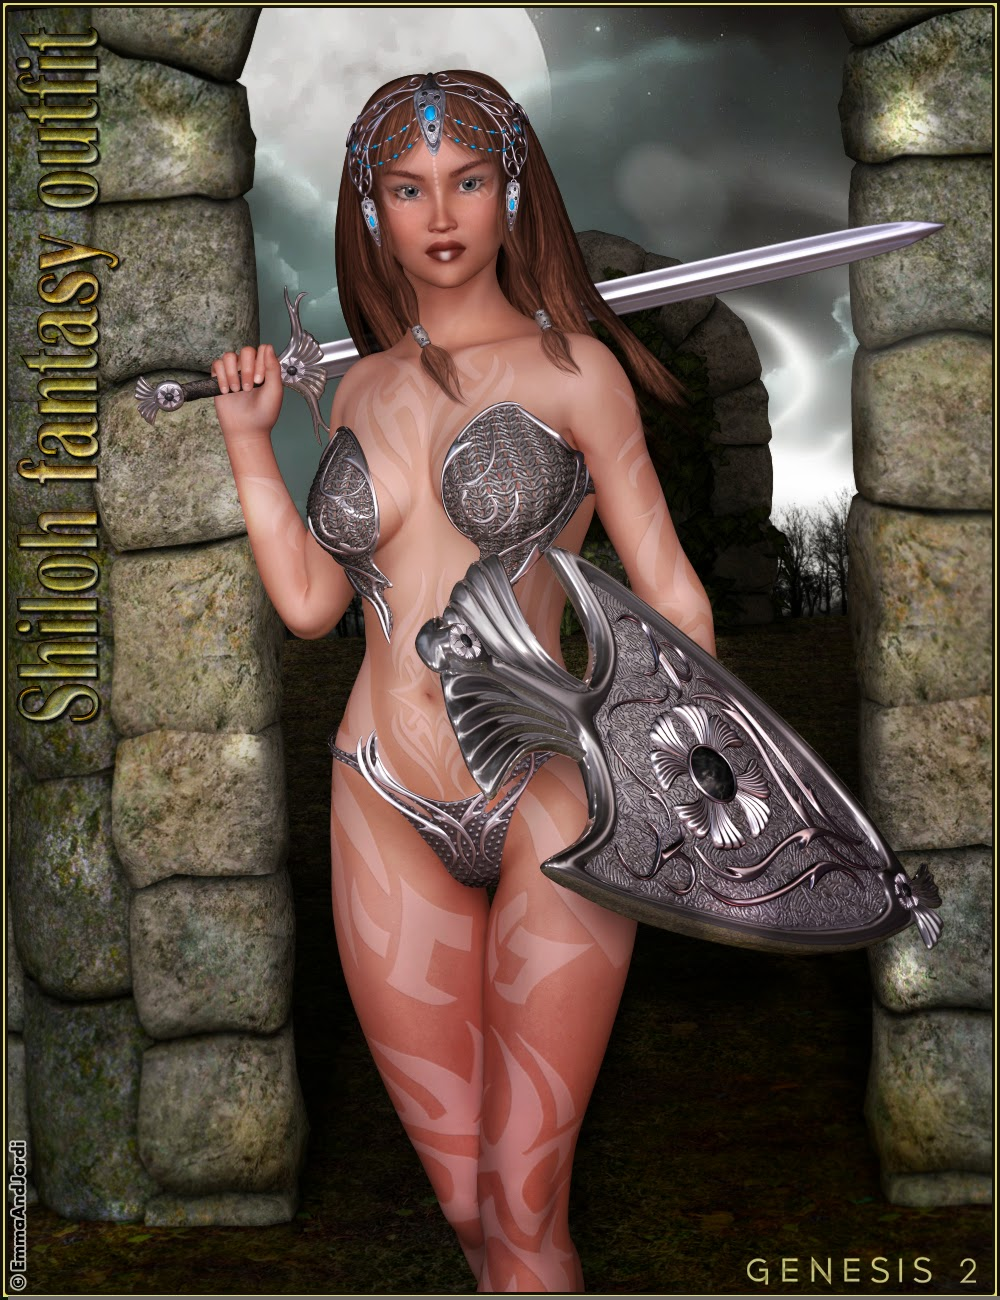 http://www.daz3d.com/shiloh-fantasy-outfit